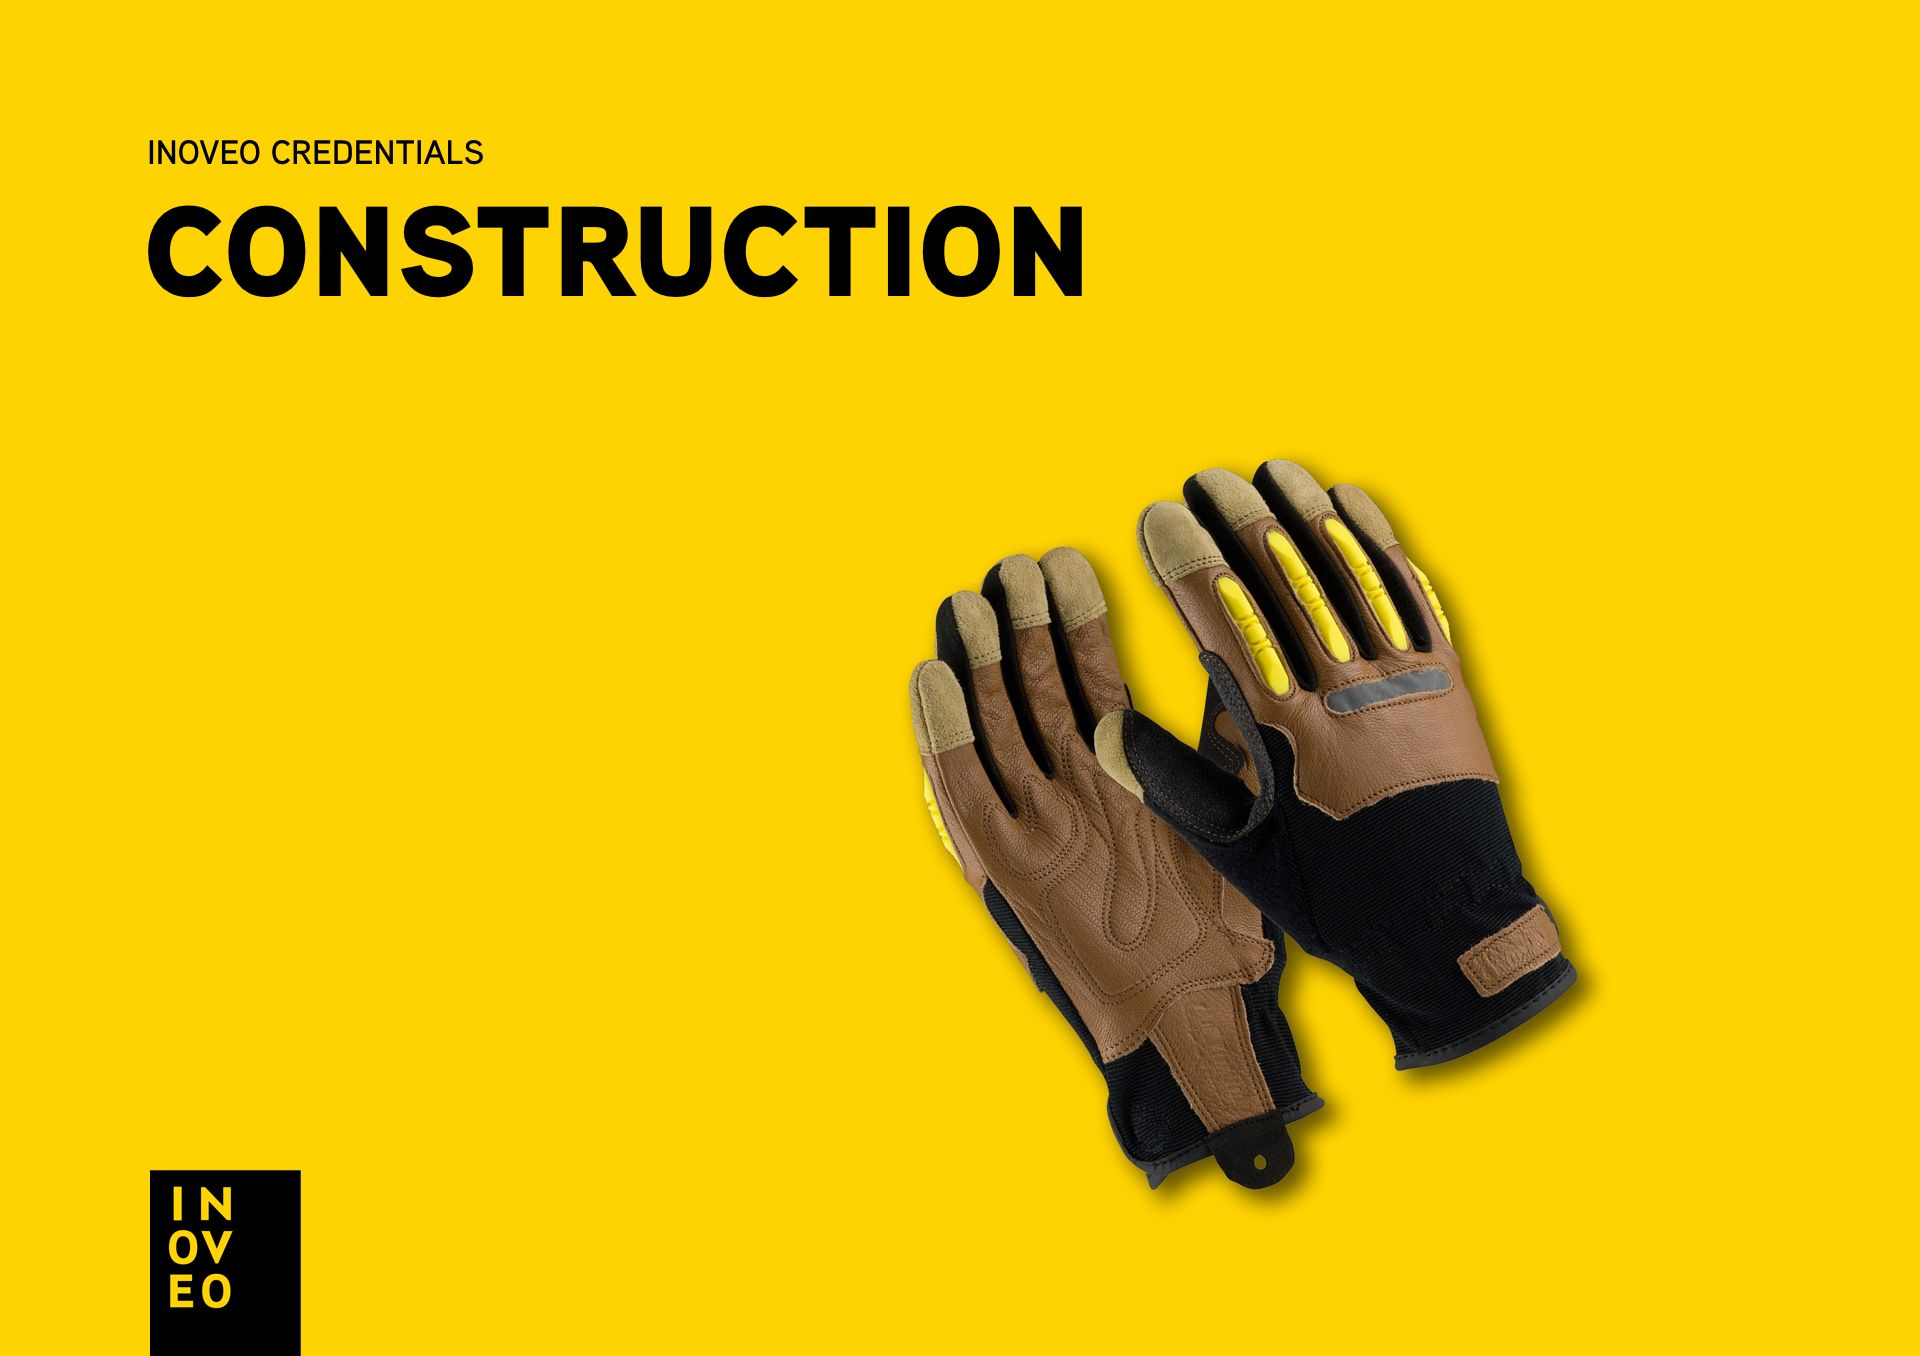 construction credentials INOVEO branding